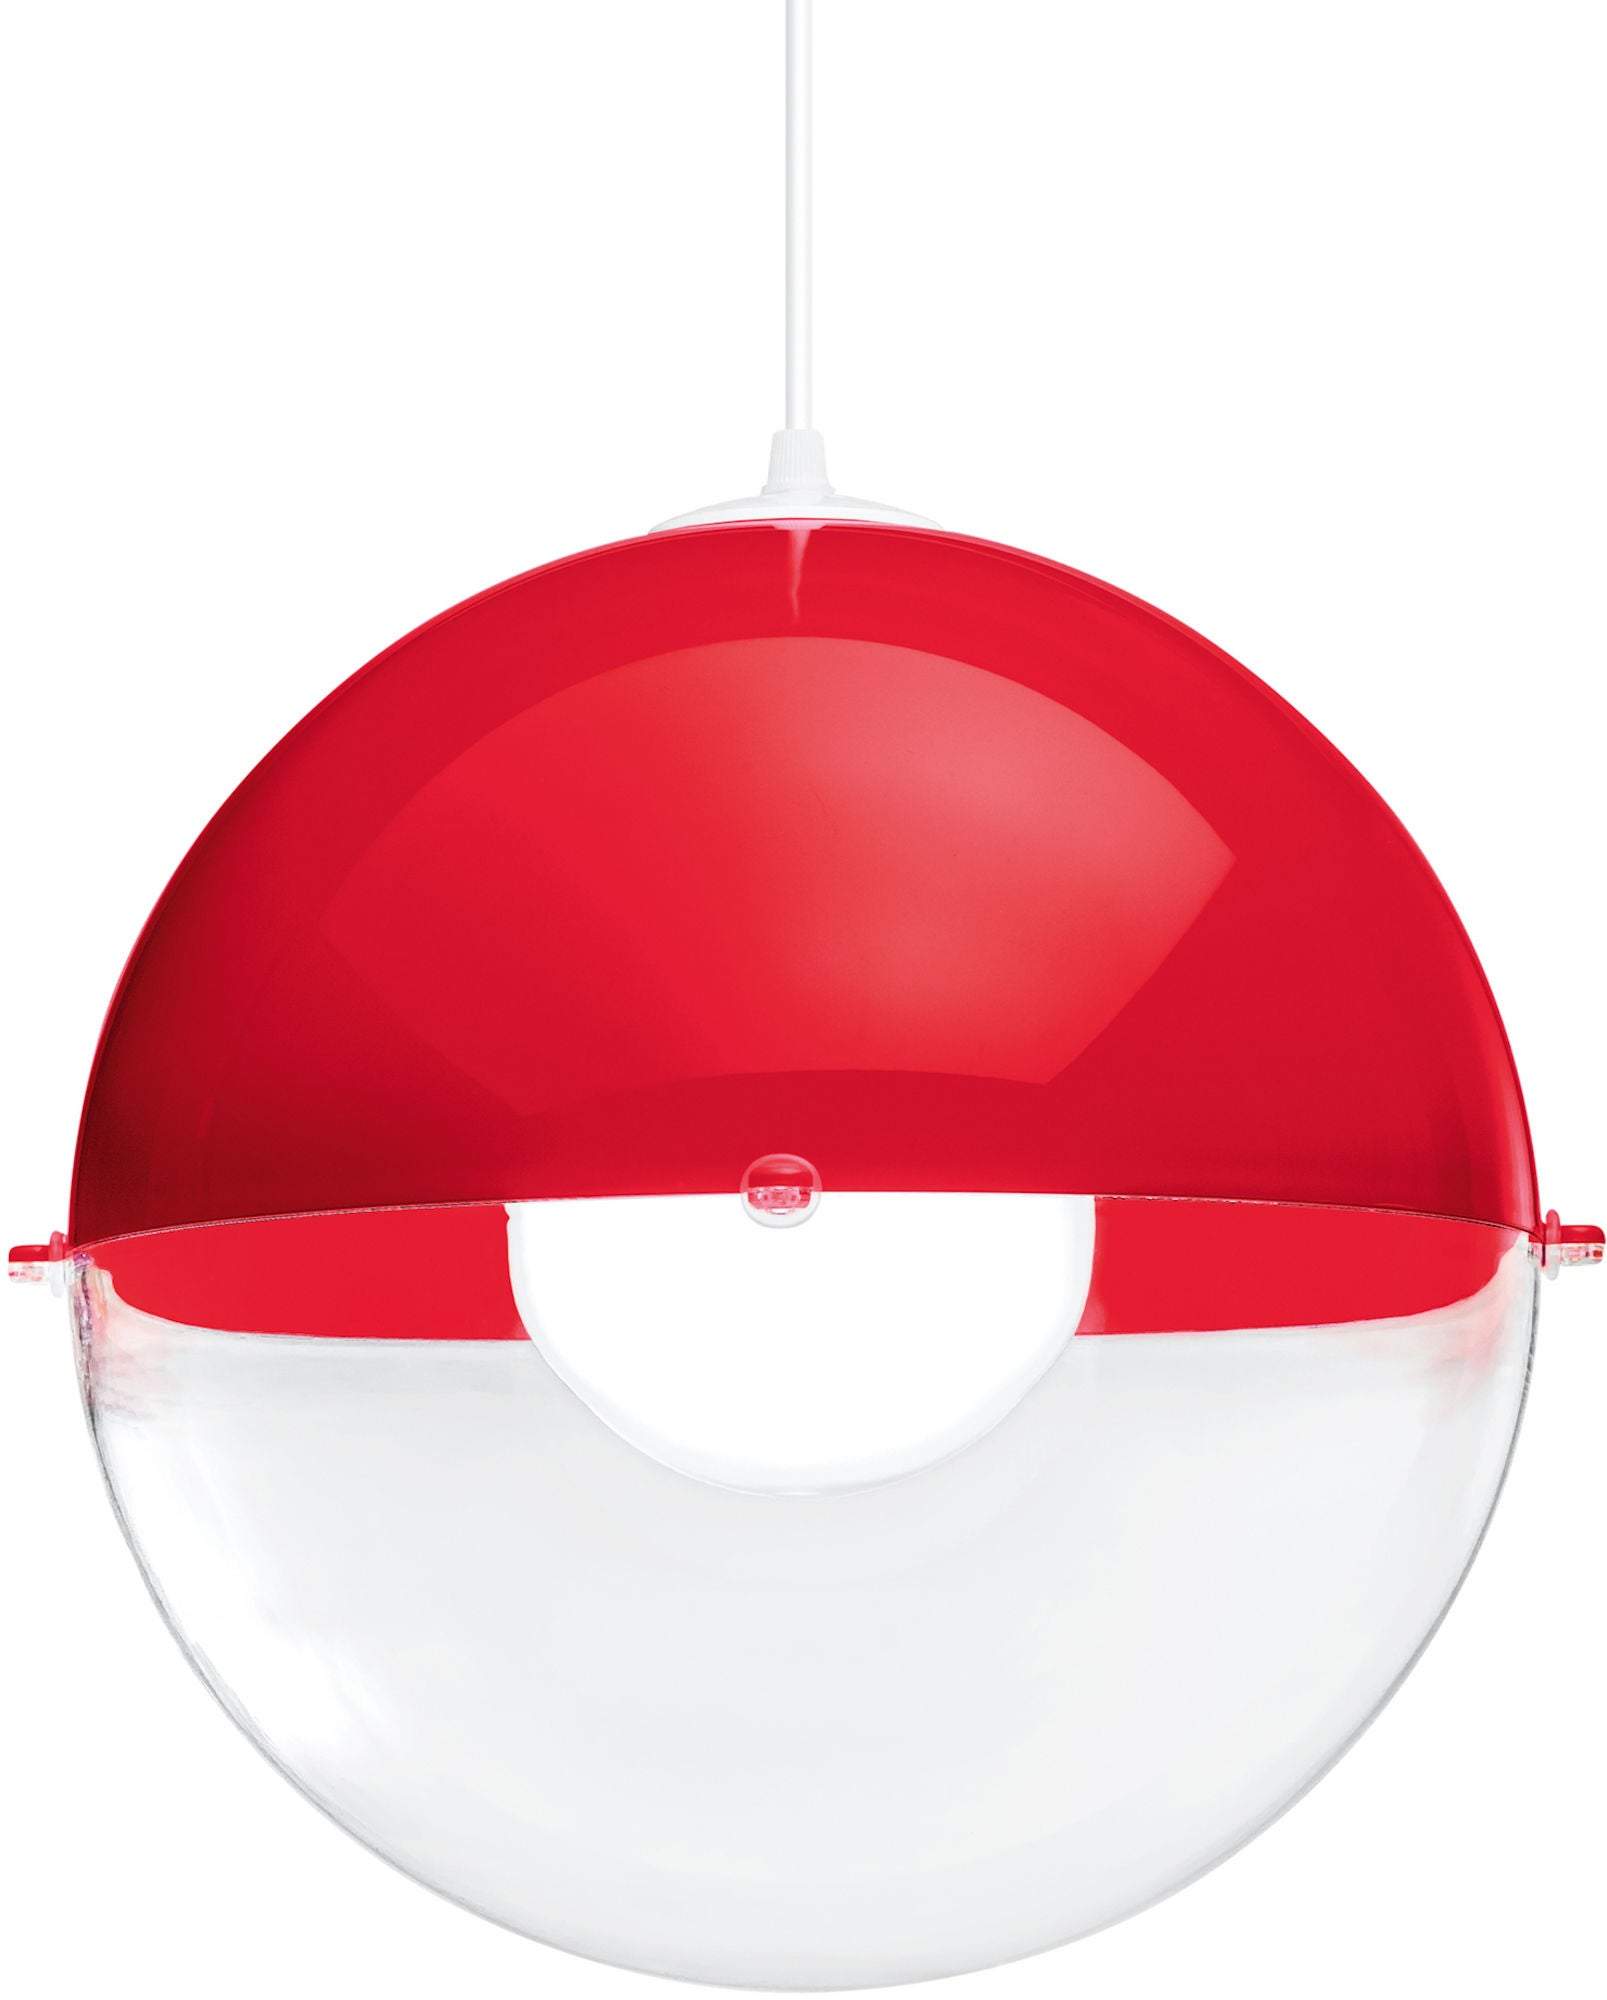 Koziol Kattovalaisin Orion Transparent, Punainen